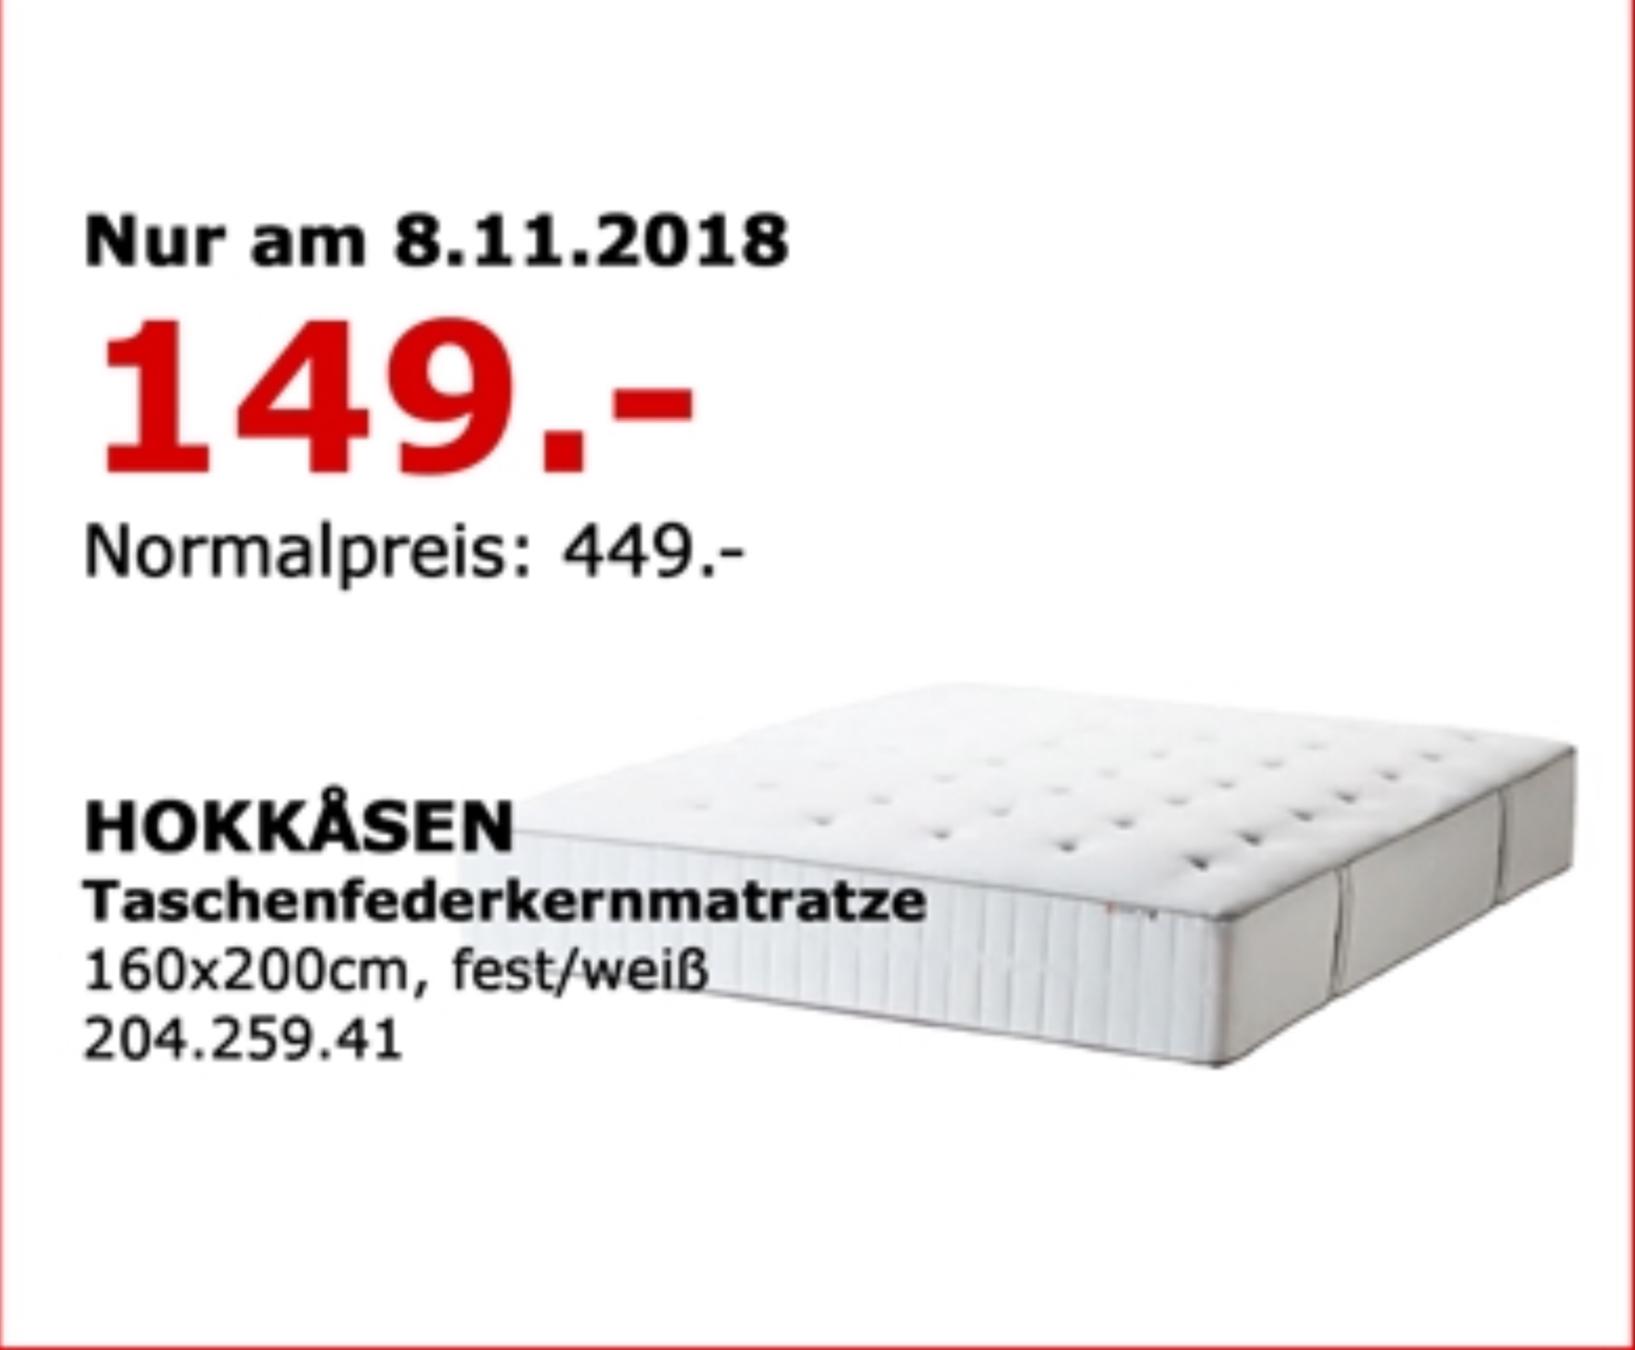 [LOKAL] Ikea Berlin-Waltersdorf HOKKÅSEN Taschenfederkernmatratze